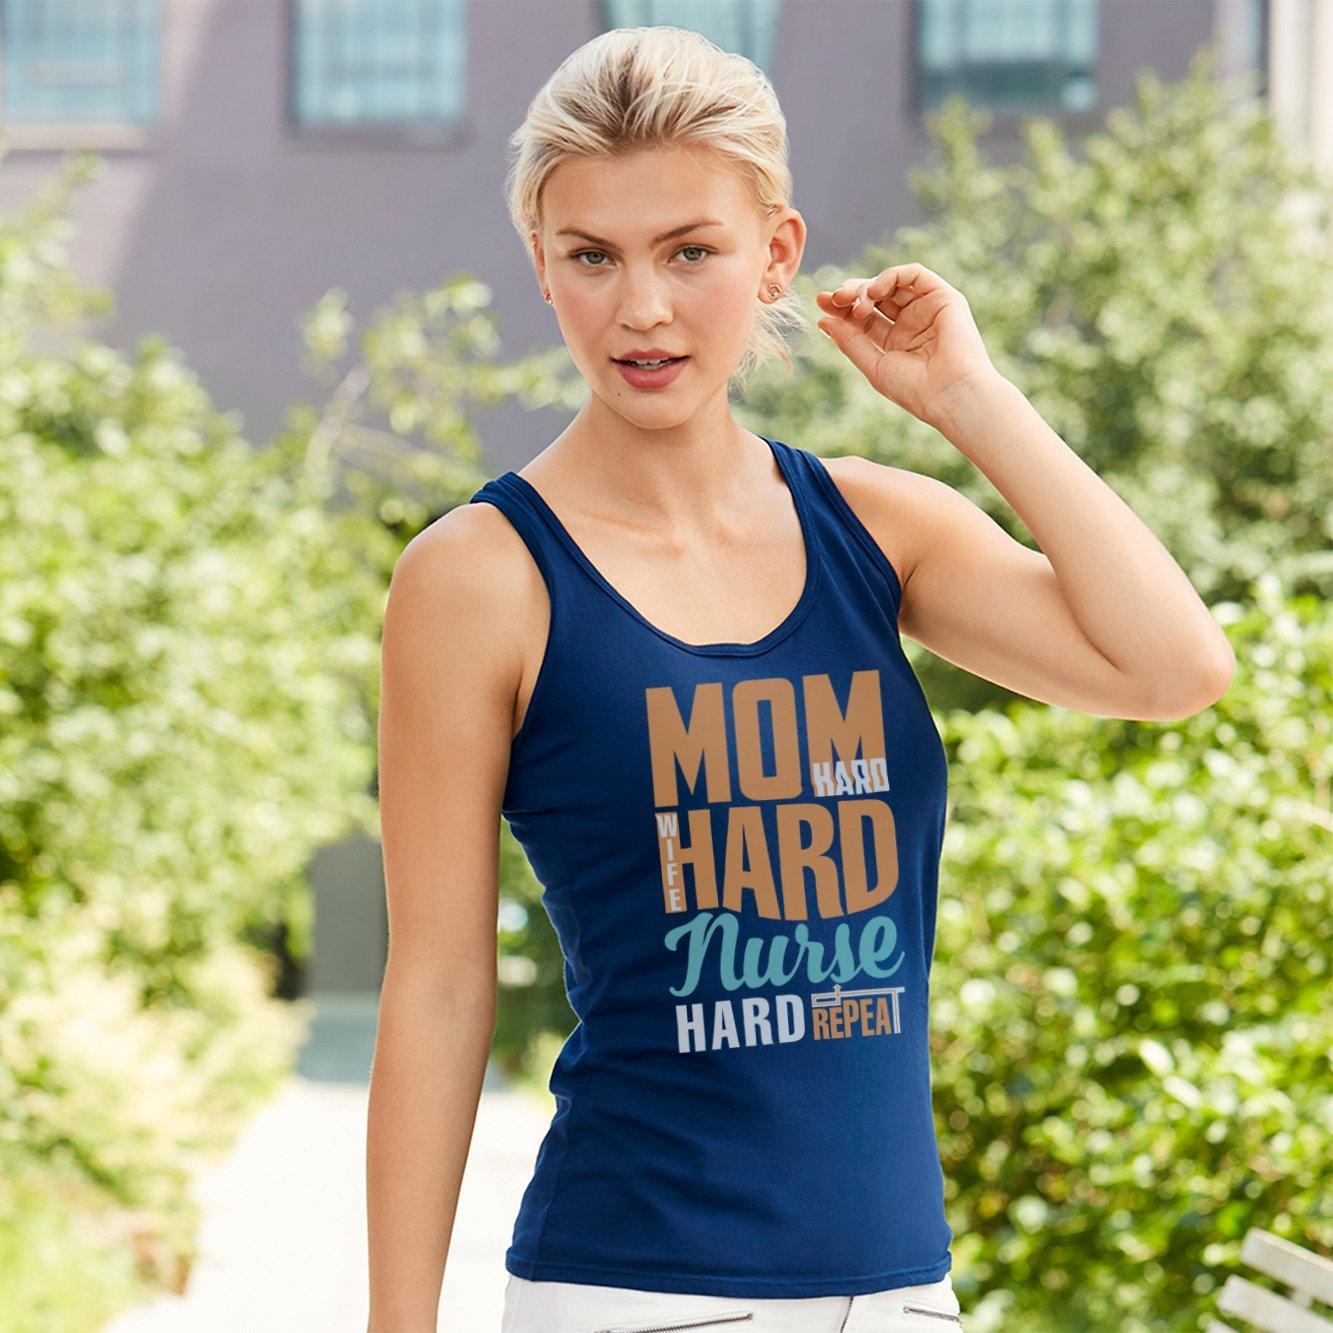 Mom Hard Wife Hard Nurse Hard Repeat-Humor Cute Funny Nurses Unisex Tank Top